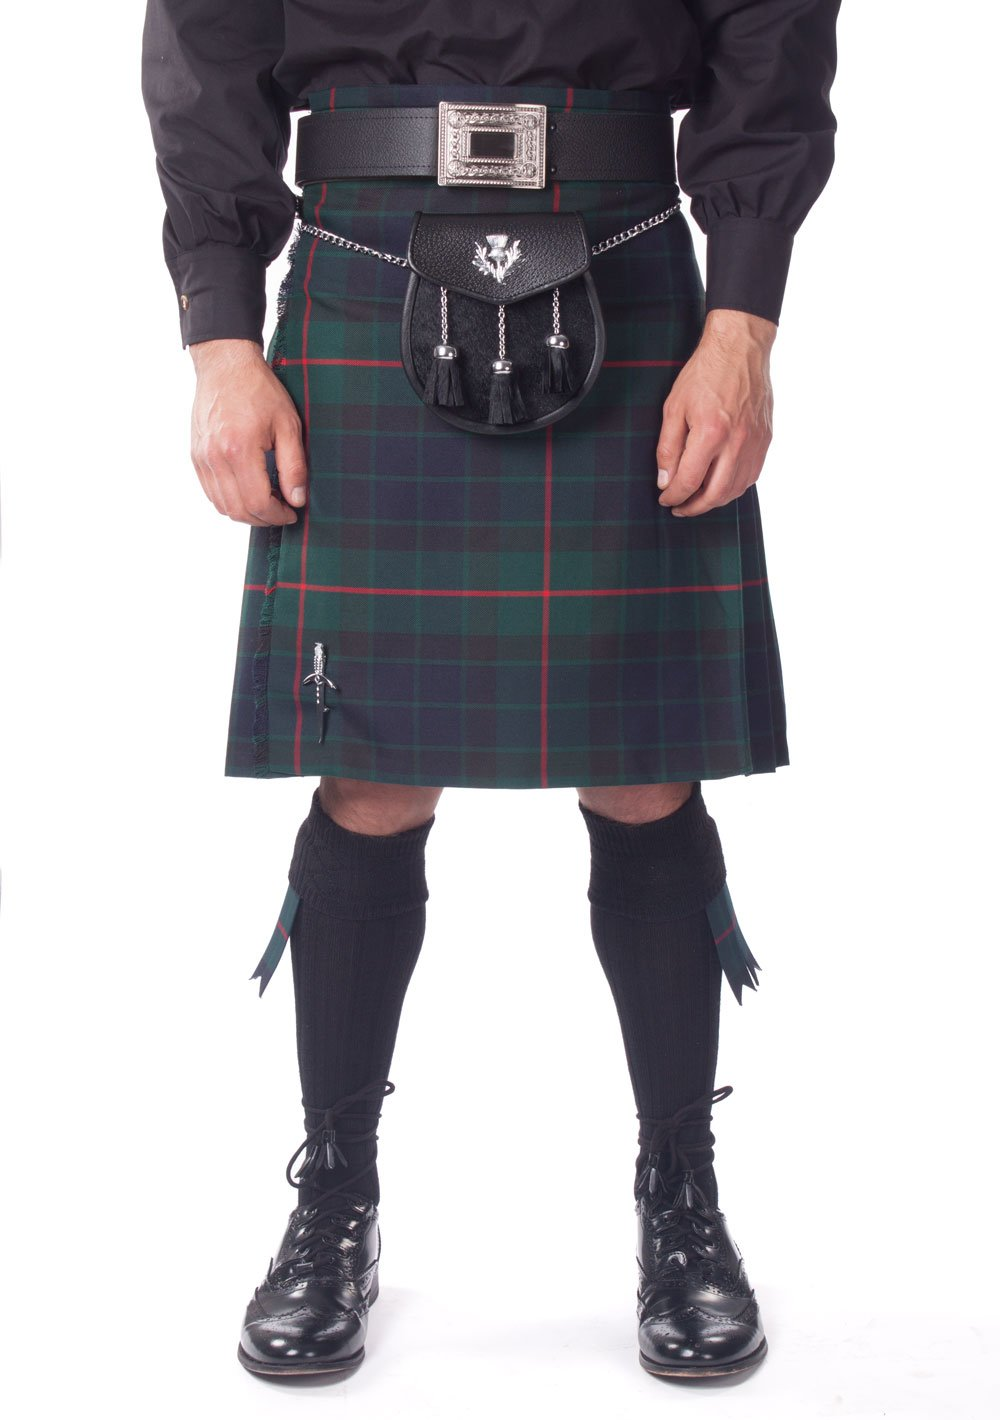 Kilt Society Mens 7 Piece Semi Dress Kilt Outfit- Gunn Tartan with Black Hose 42'' to 46''